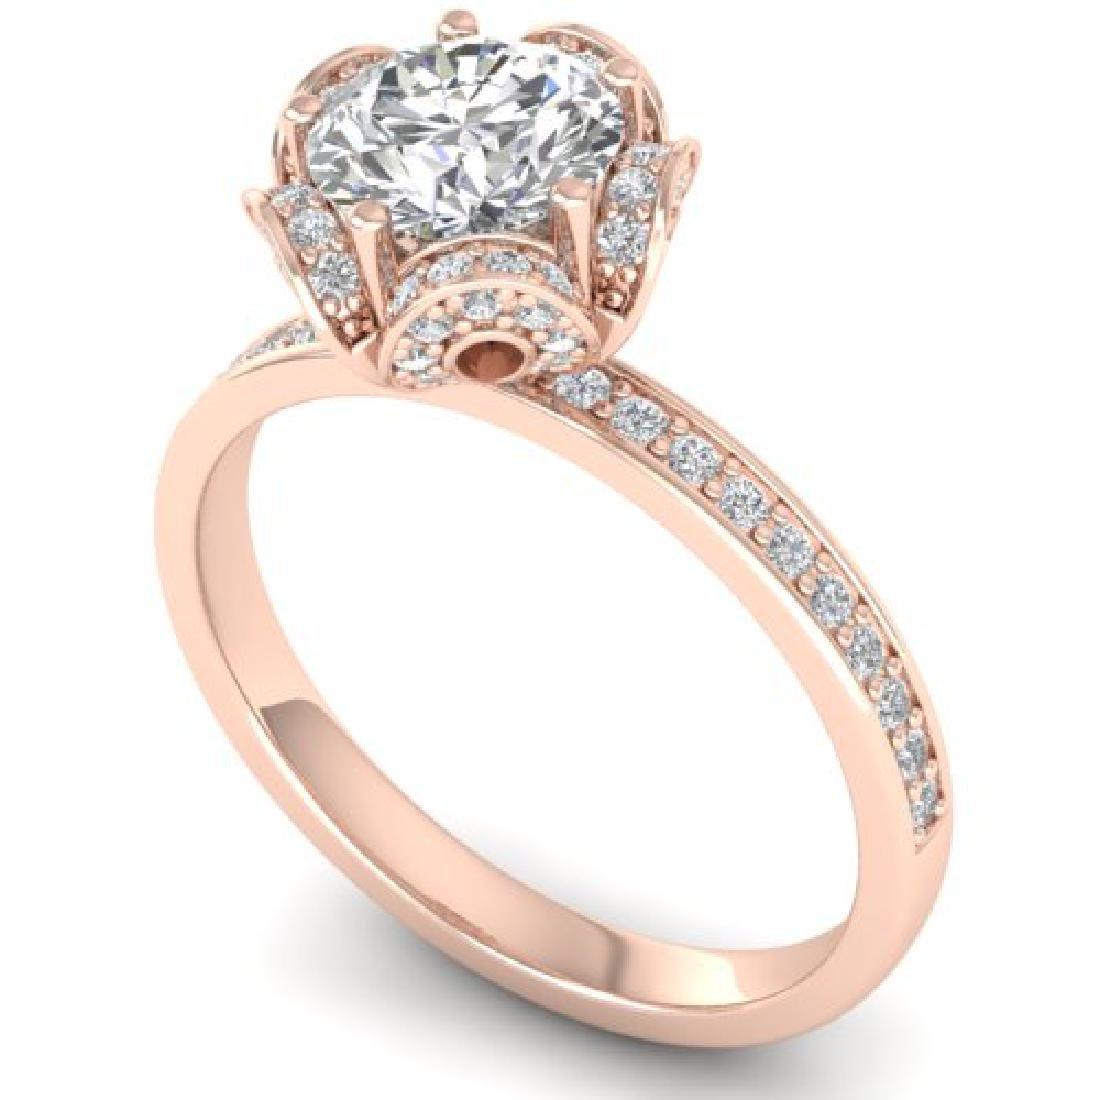 1.75 CTW Certified VS/SI Diamond Art Deco Ring 18K Rose - 2